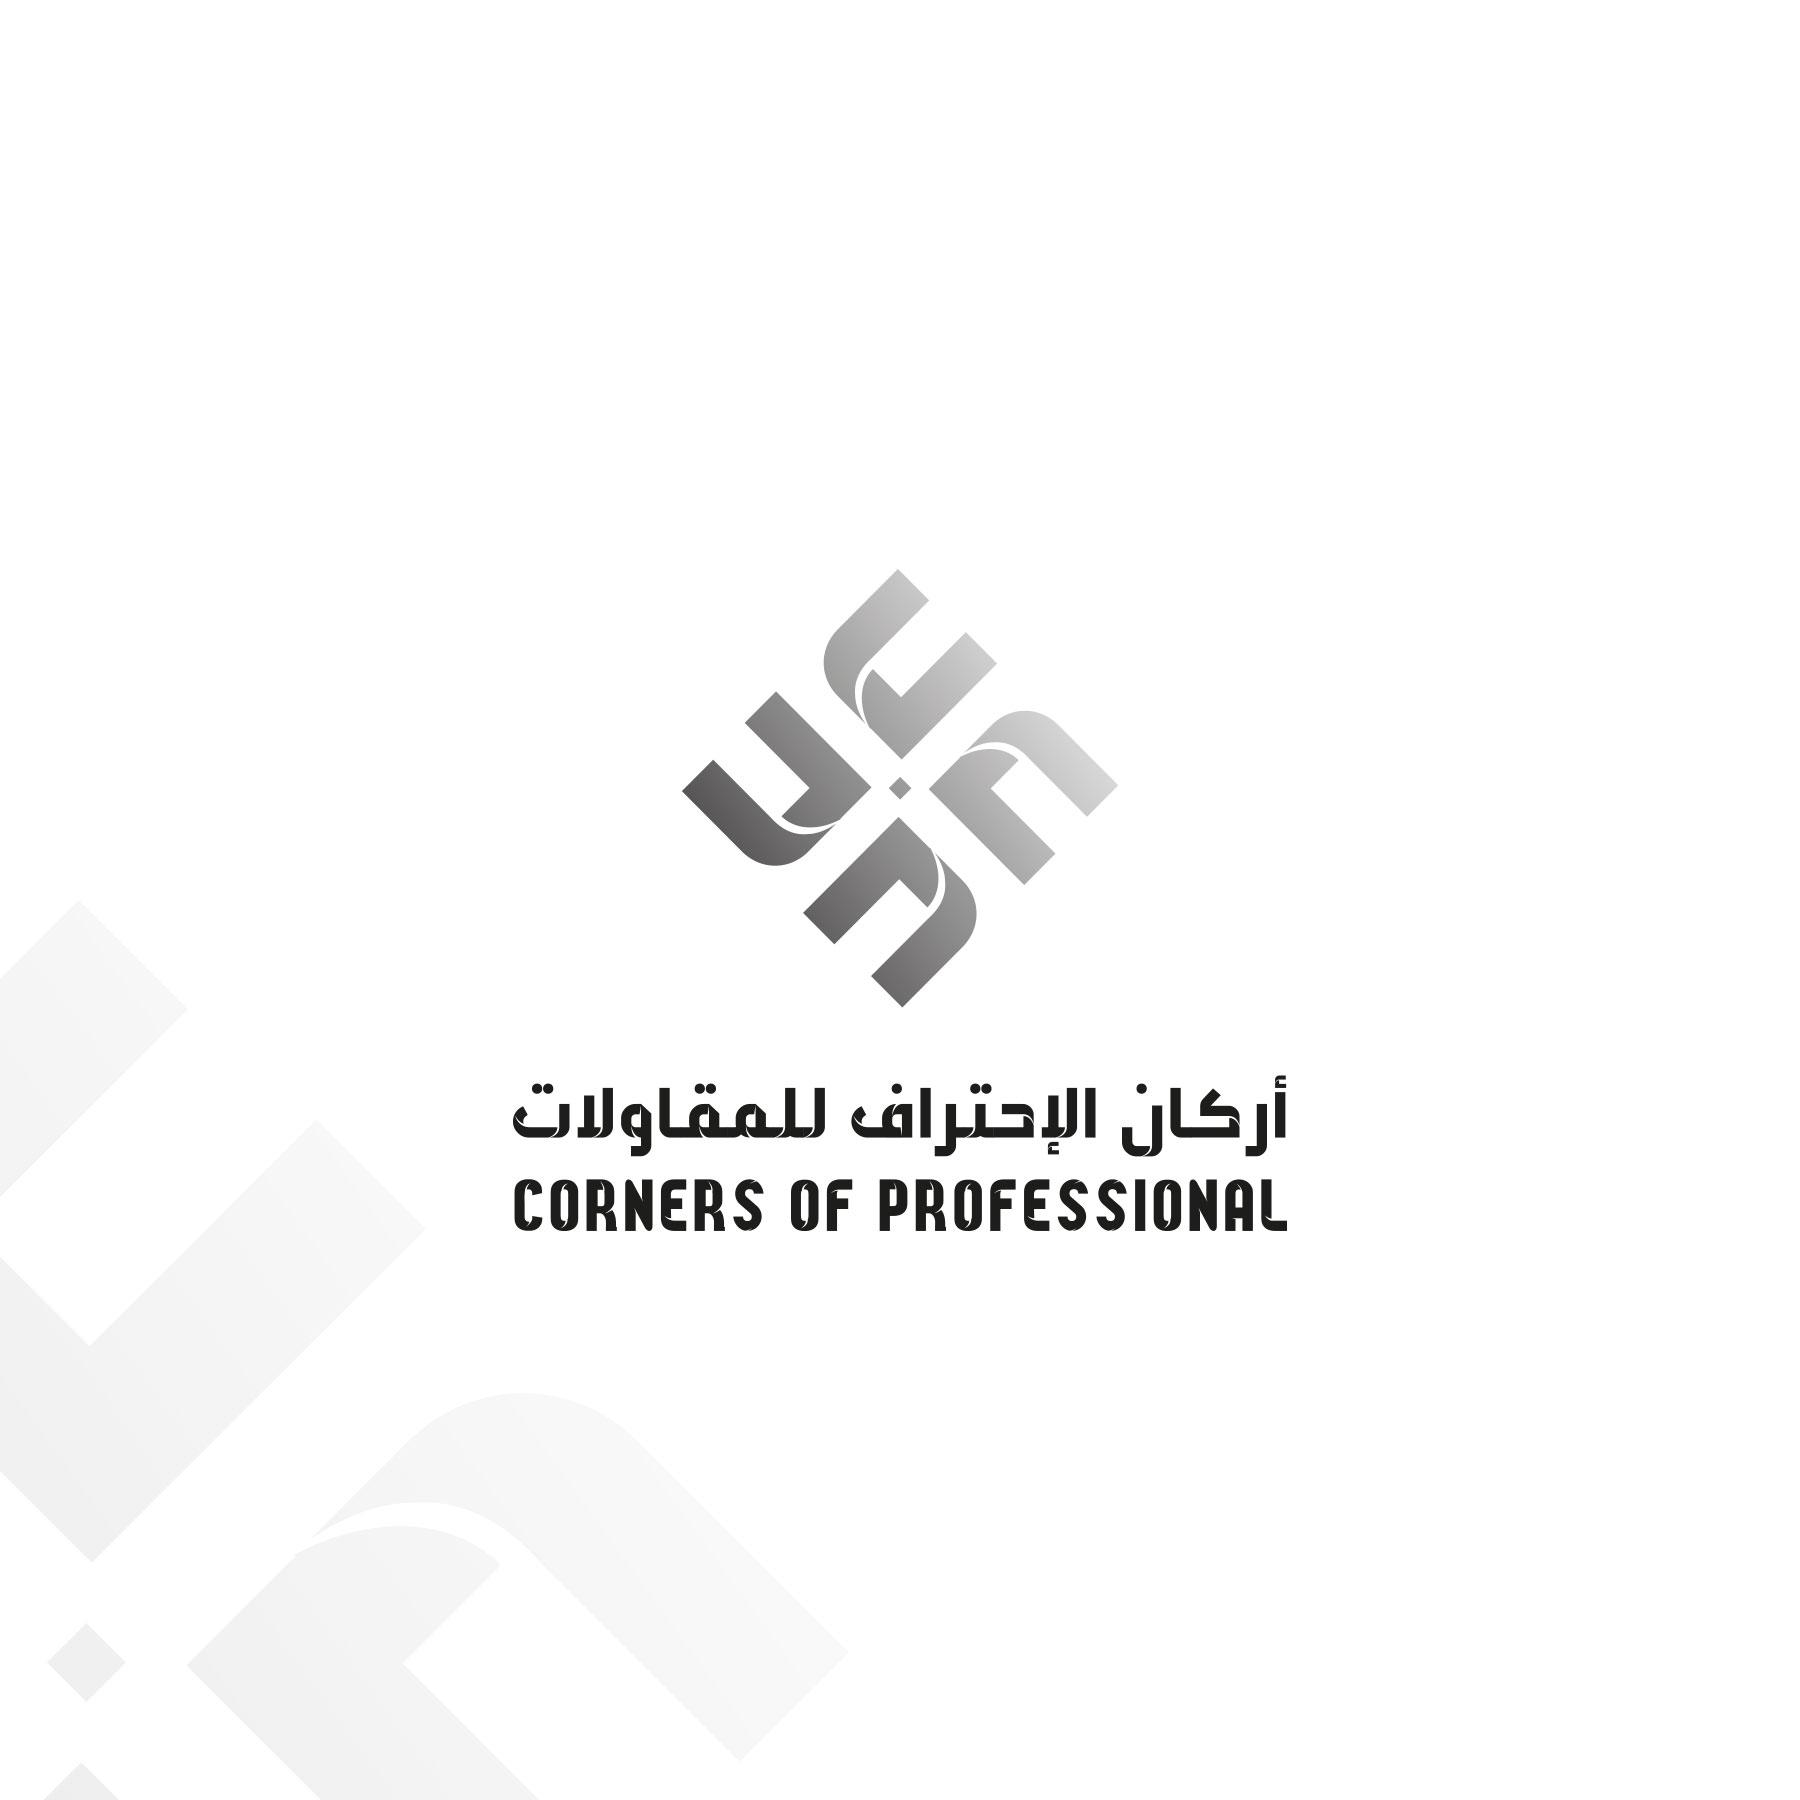 Aarda Info الصور والأفكار حول تصميم شعارات شركات مقاولات